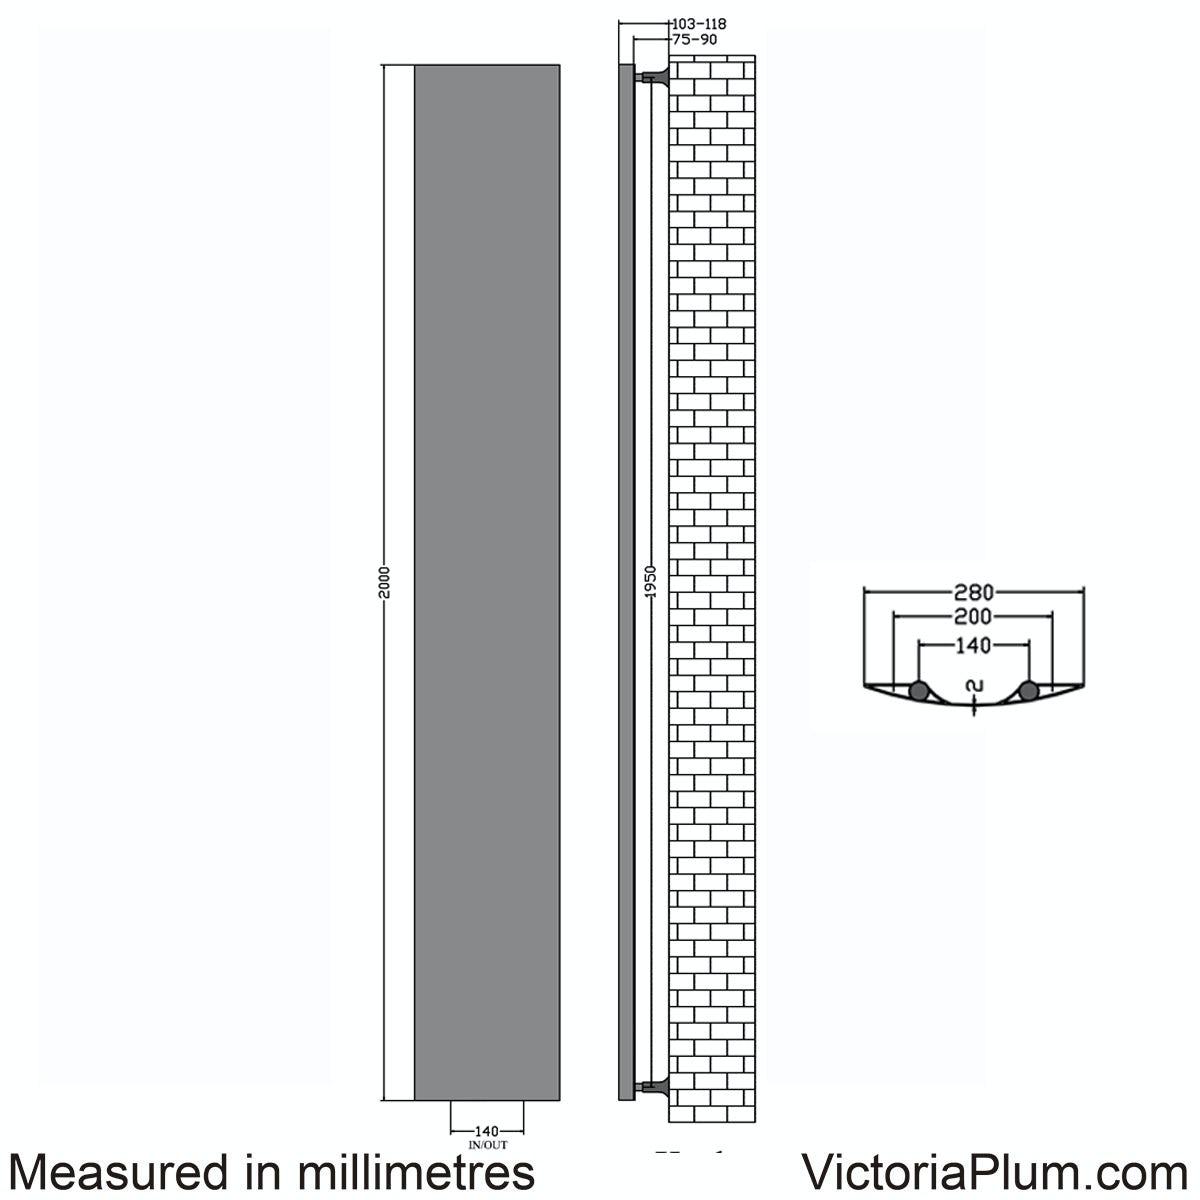 Dimensions for Korlea black vertical radiator 2000 x 280